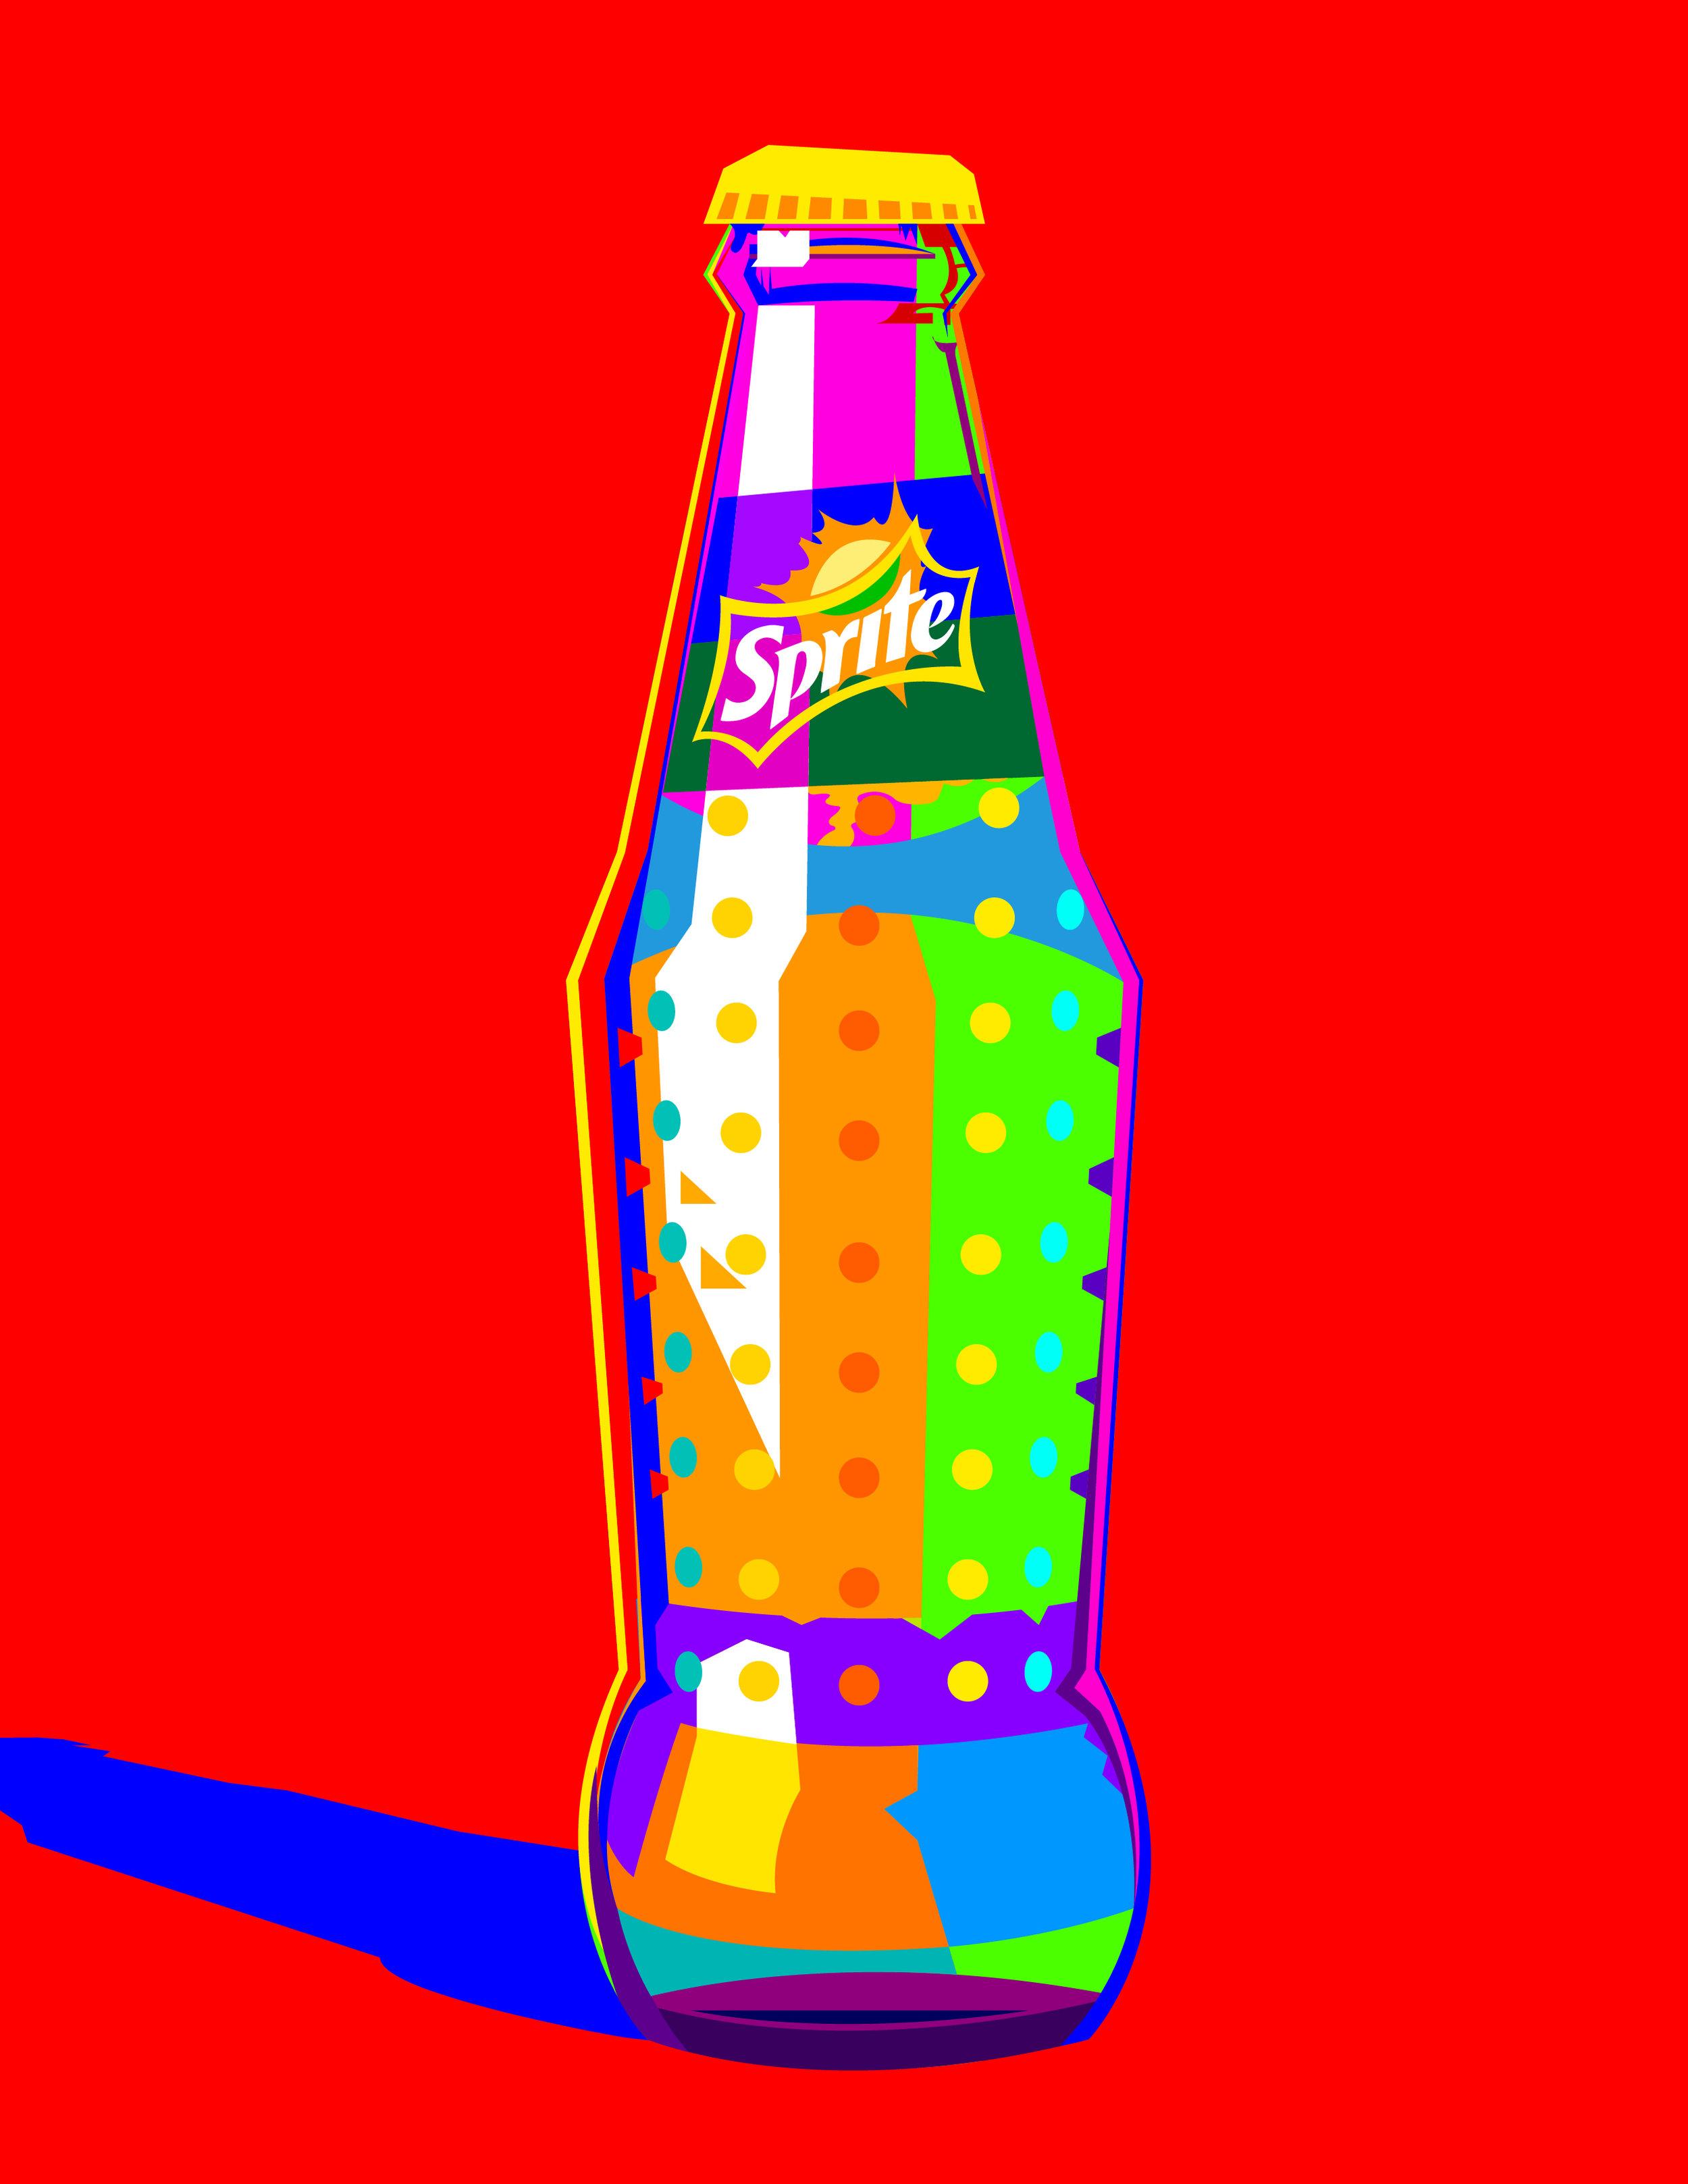 Sprite-01.jpg